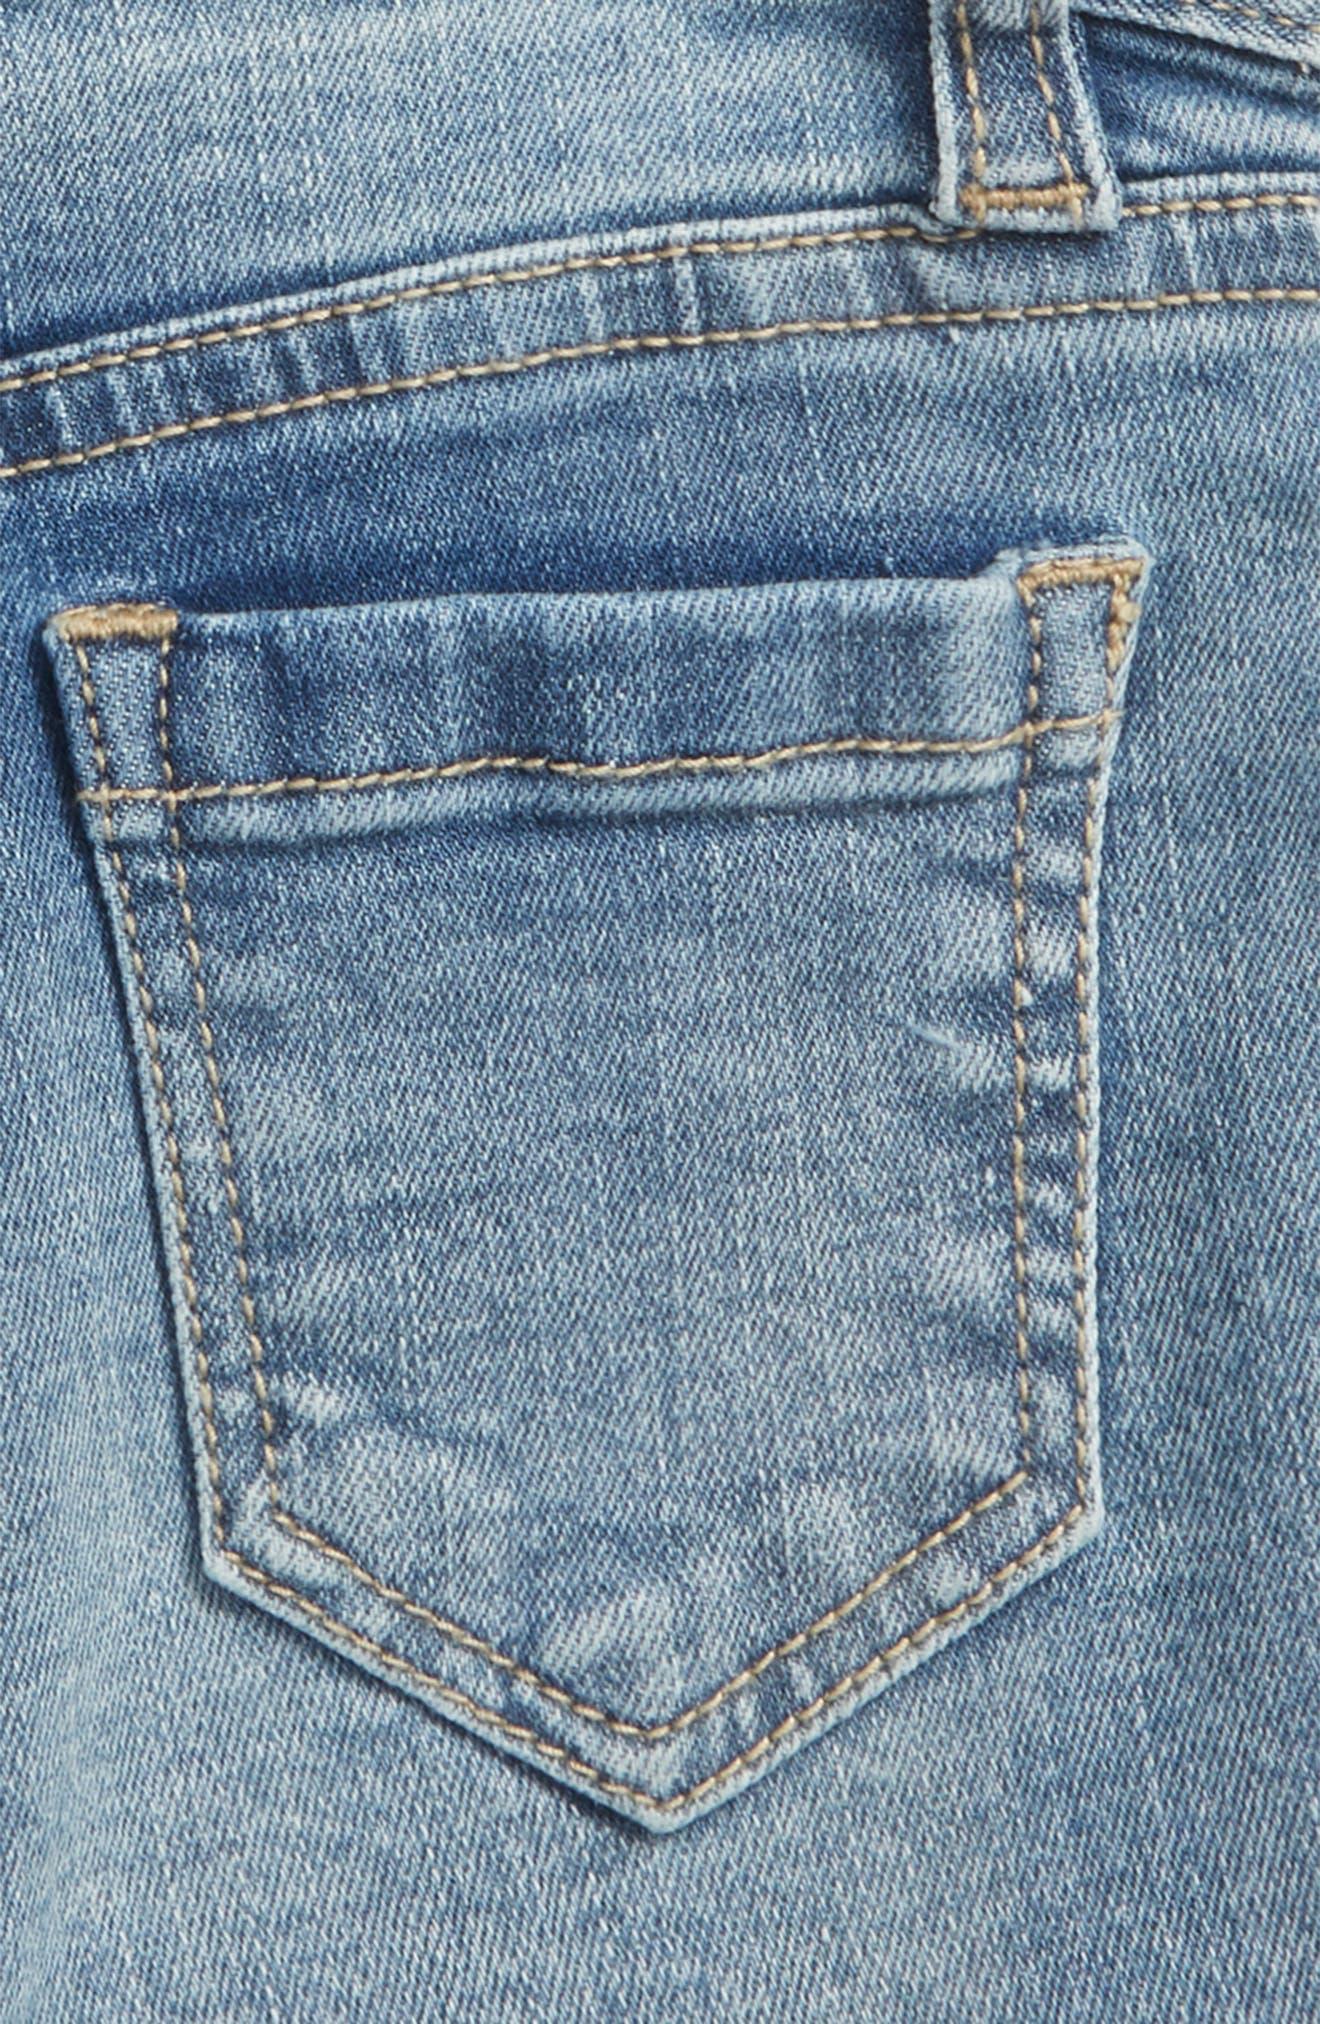 Embroidered Frayed Hem Denim Shorts,                             Alternate thumbnail 3, color,                             Medium Authentic